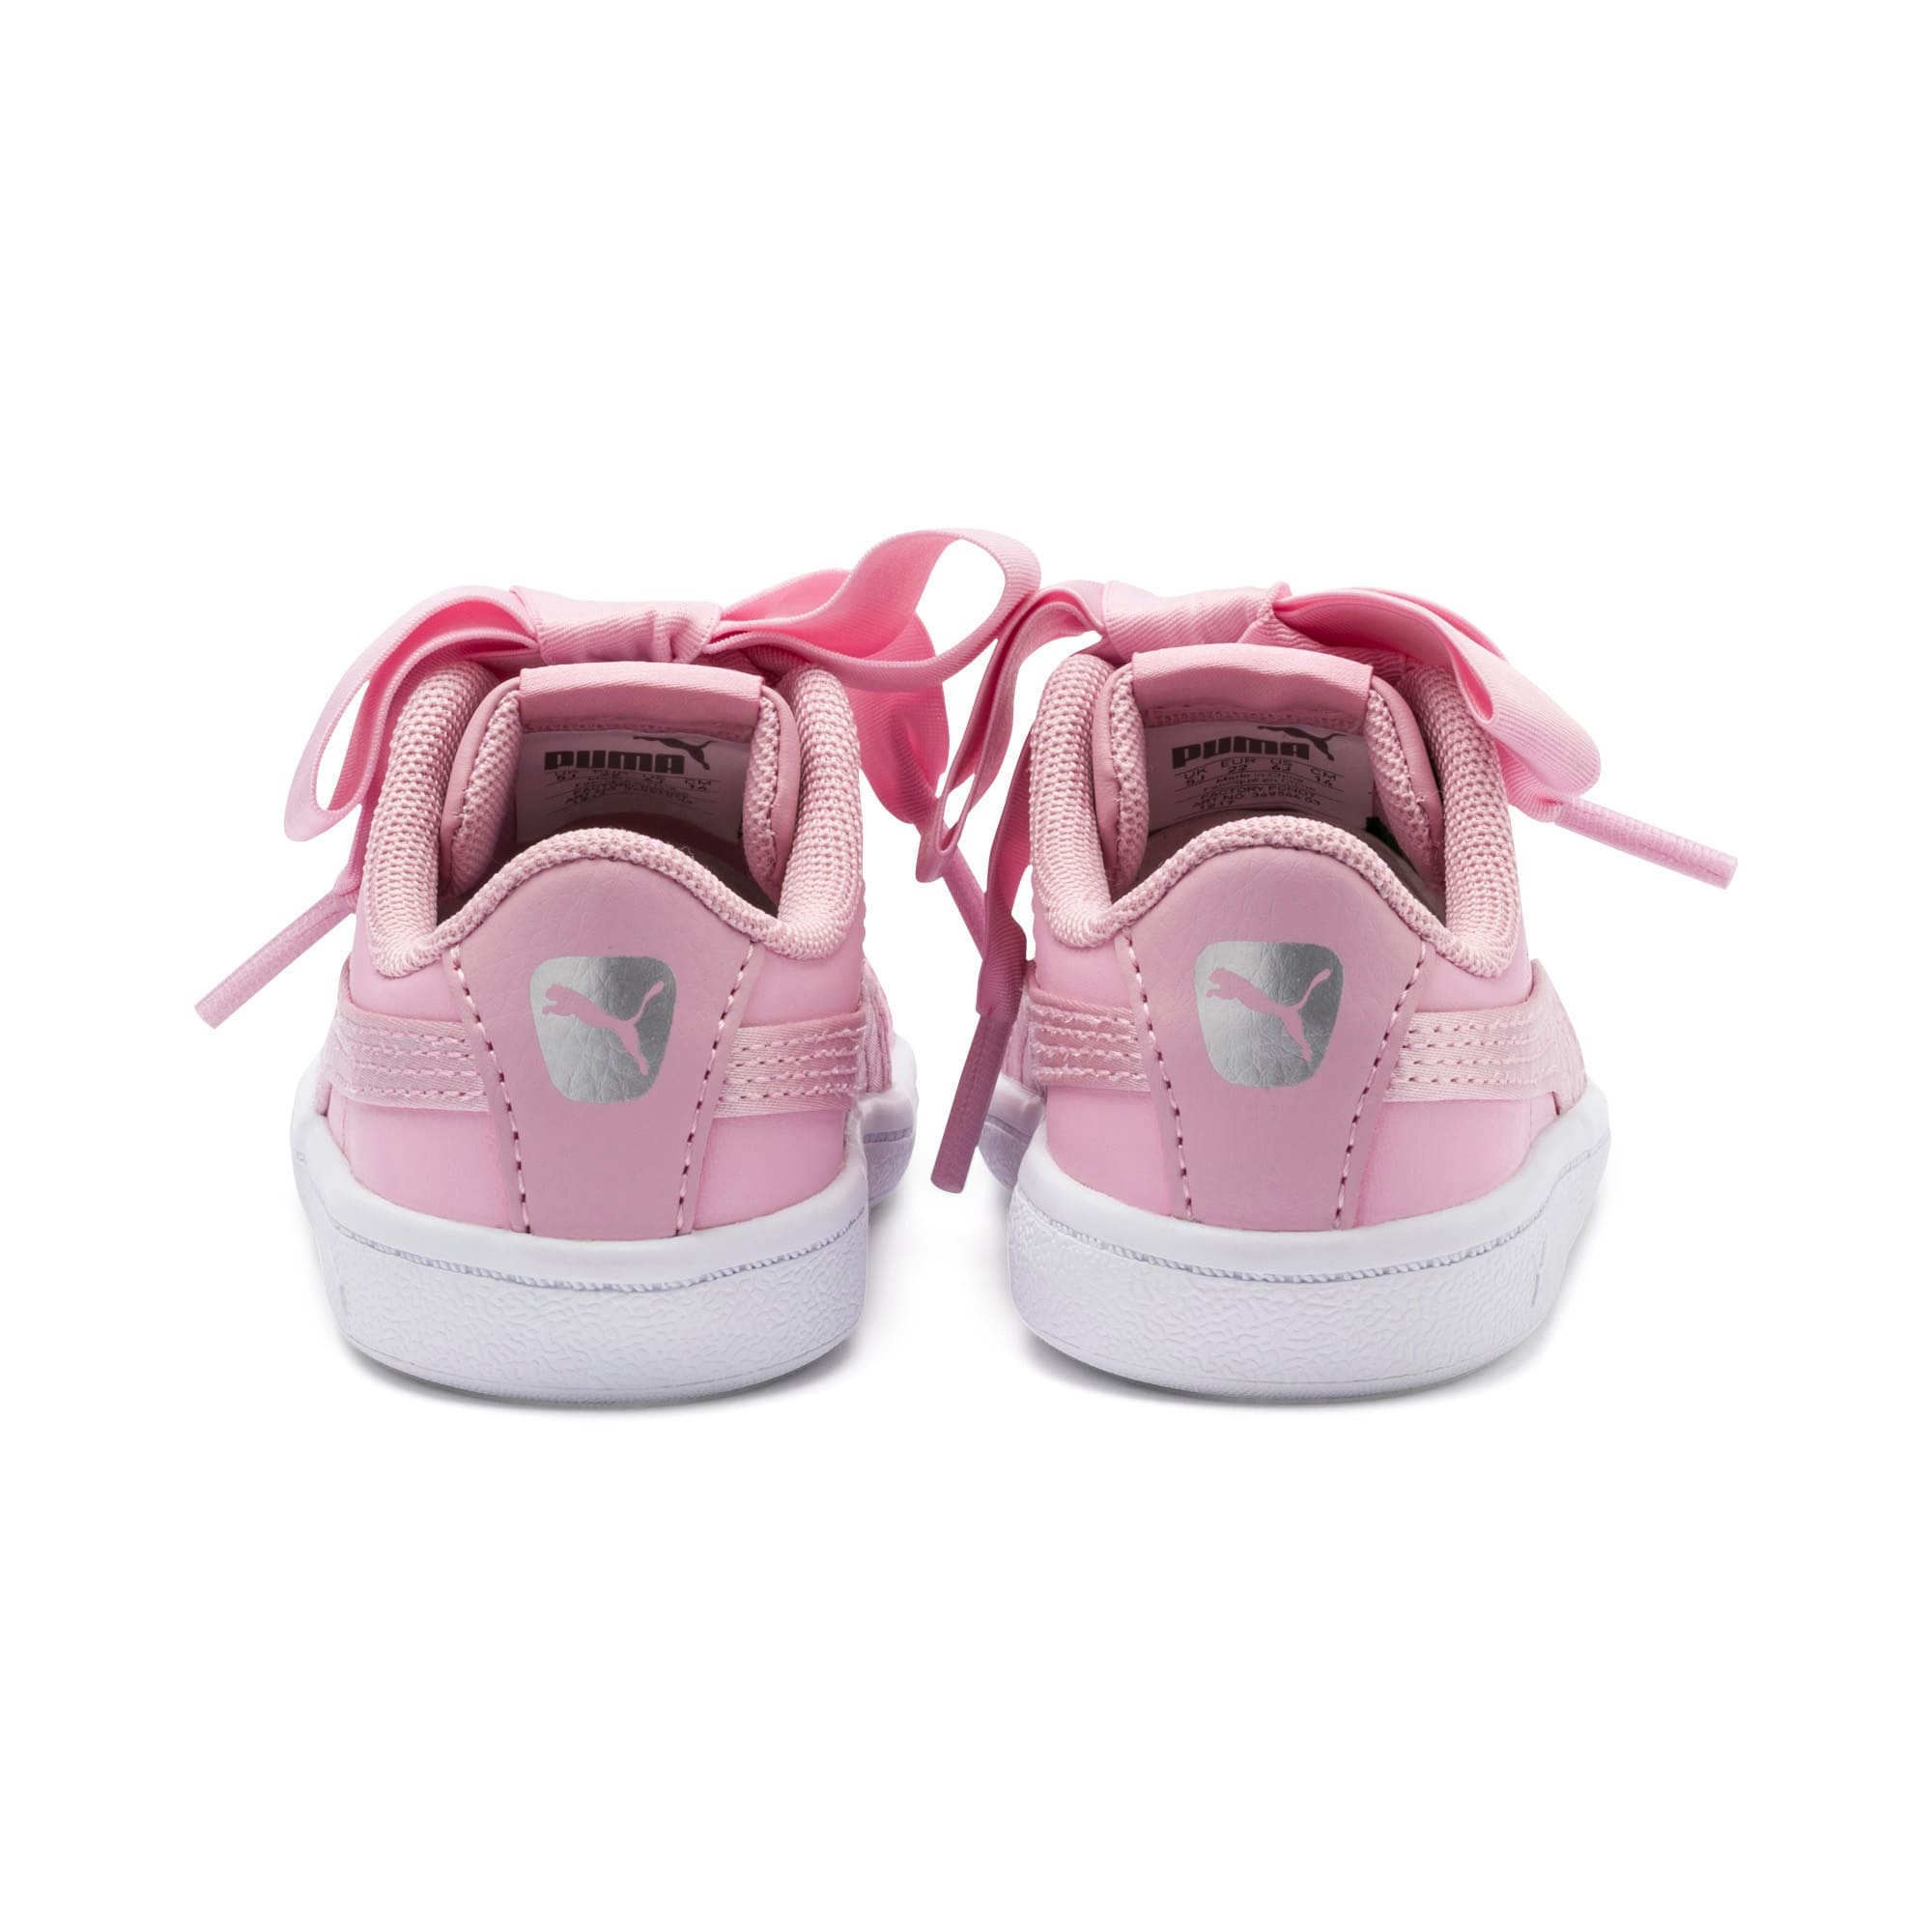 Miniatura 3 de ZapatosPUMA Vikky Ribbon Satin AC para niños, Pale Pink-Pale Pink, mediano